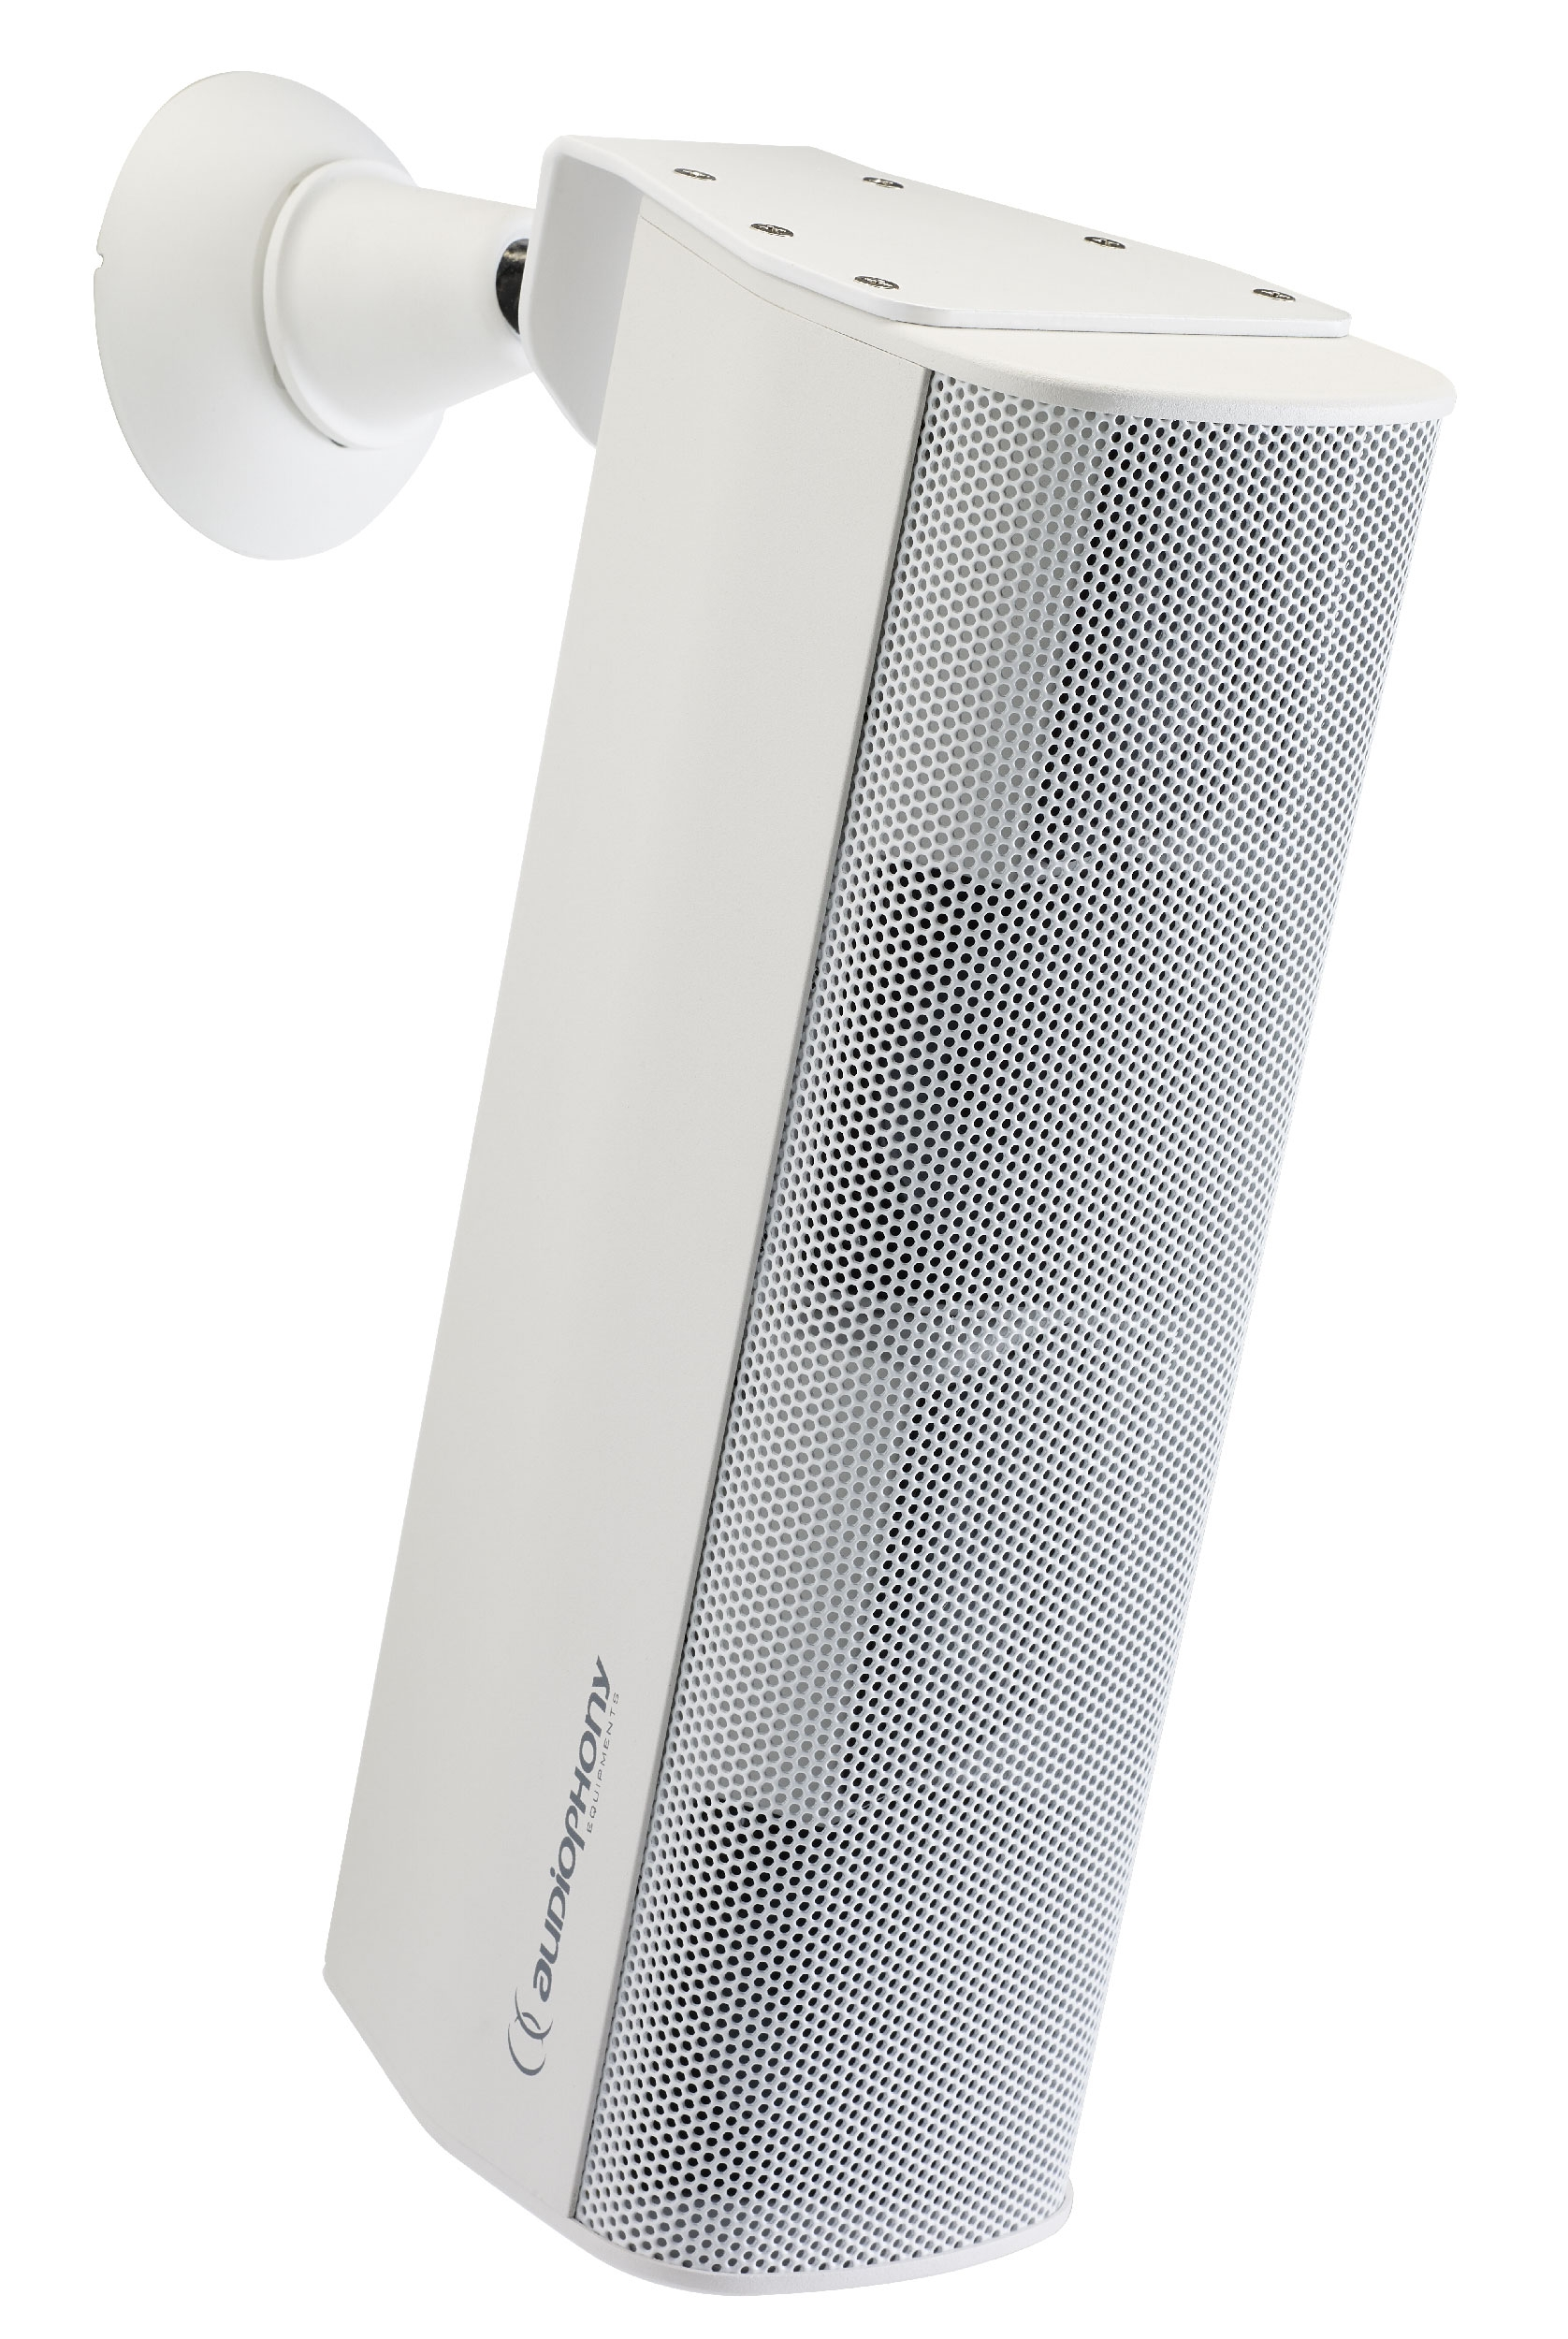 Adjustable wall mount for iLINE23w and iLINE43w - White